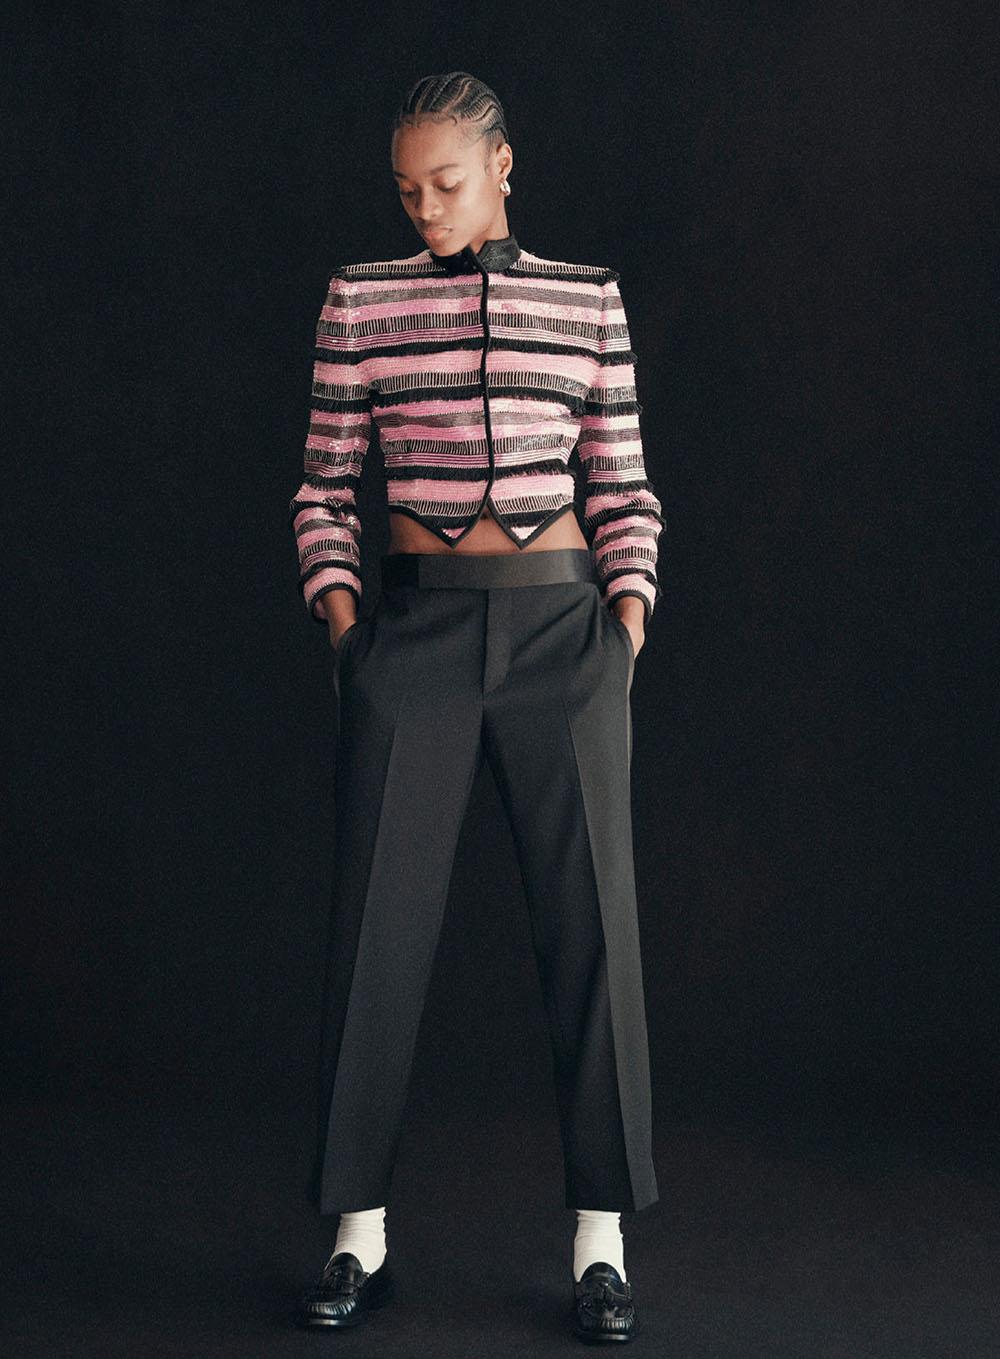 Mayowa Nicholas by Jody Rogac for Harper's Bazaar US November 2020